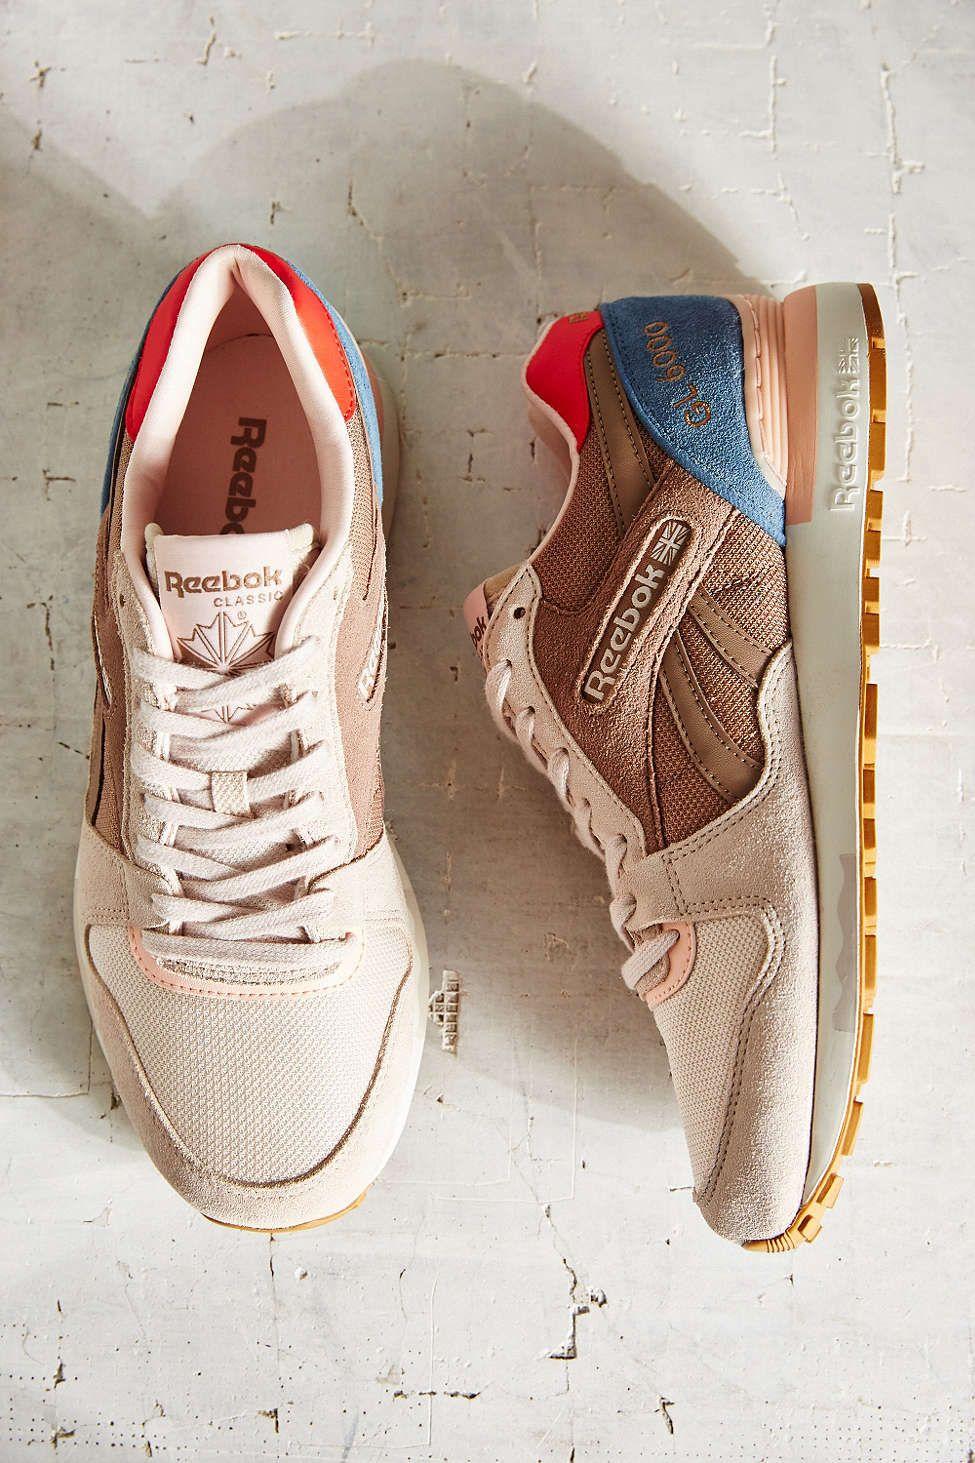 Sneakers de course Fleur GL 6000 Reebok | Baskets de course